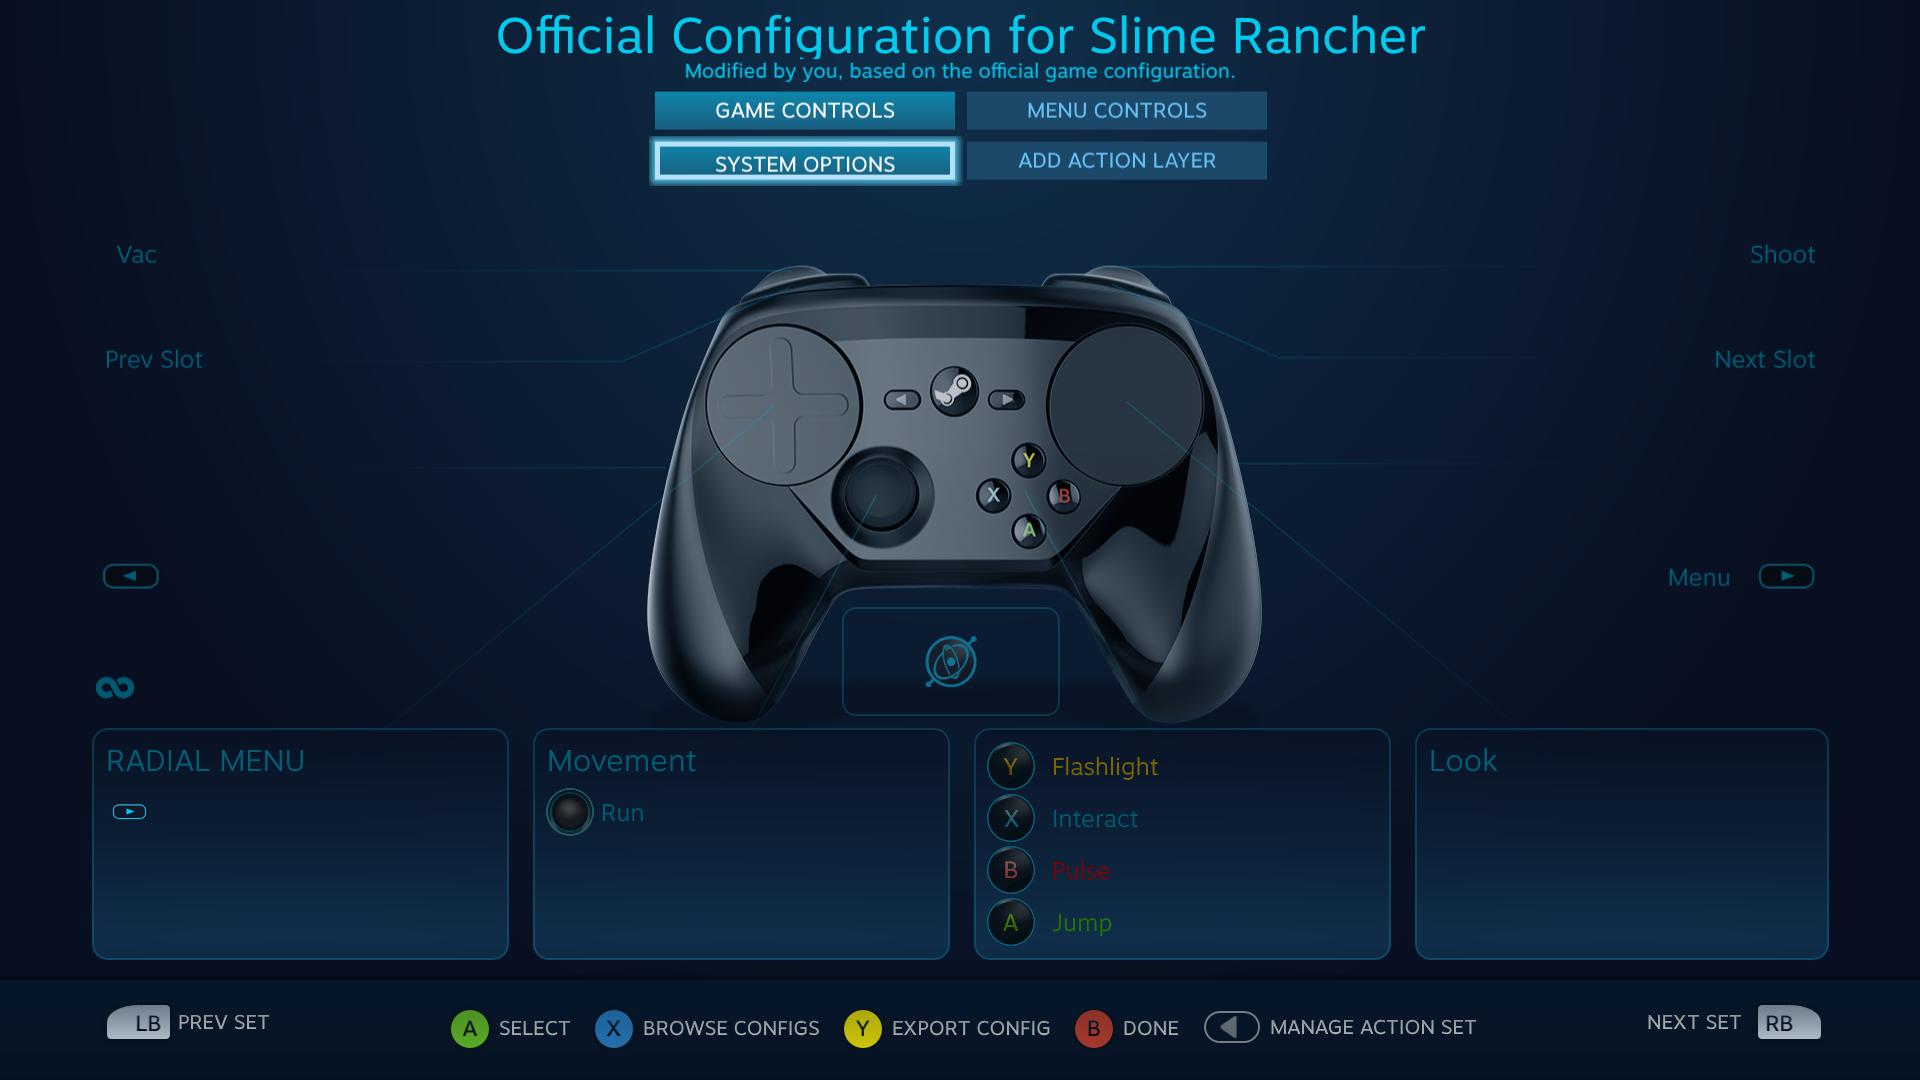 slime_rancher_radial_menu_config_4.png